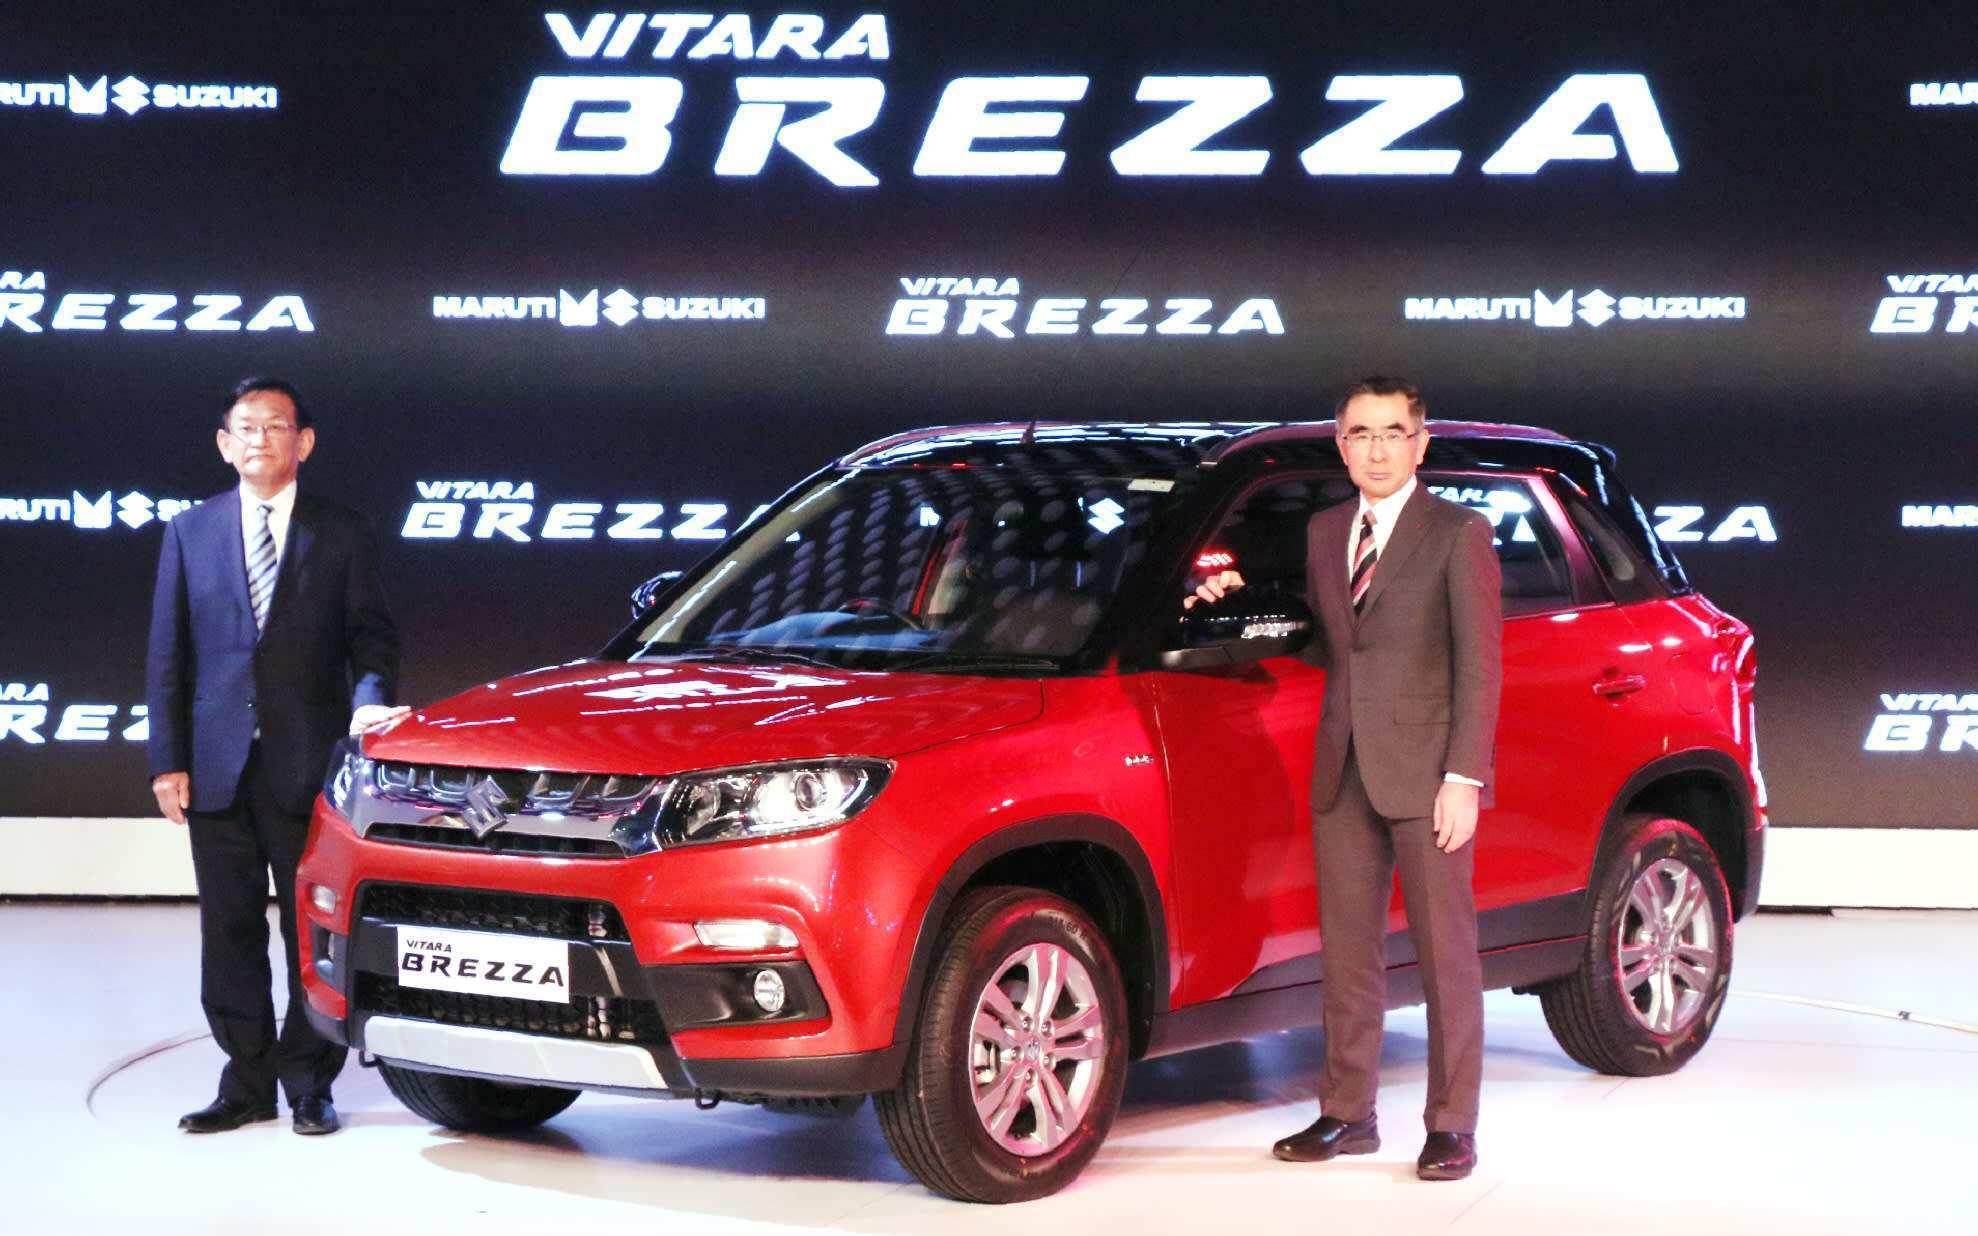 65 Concept of Motor Suzuki 2020 Spesification with Motor Suzuki 2020